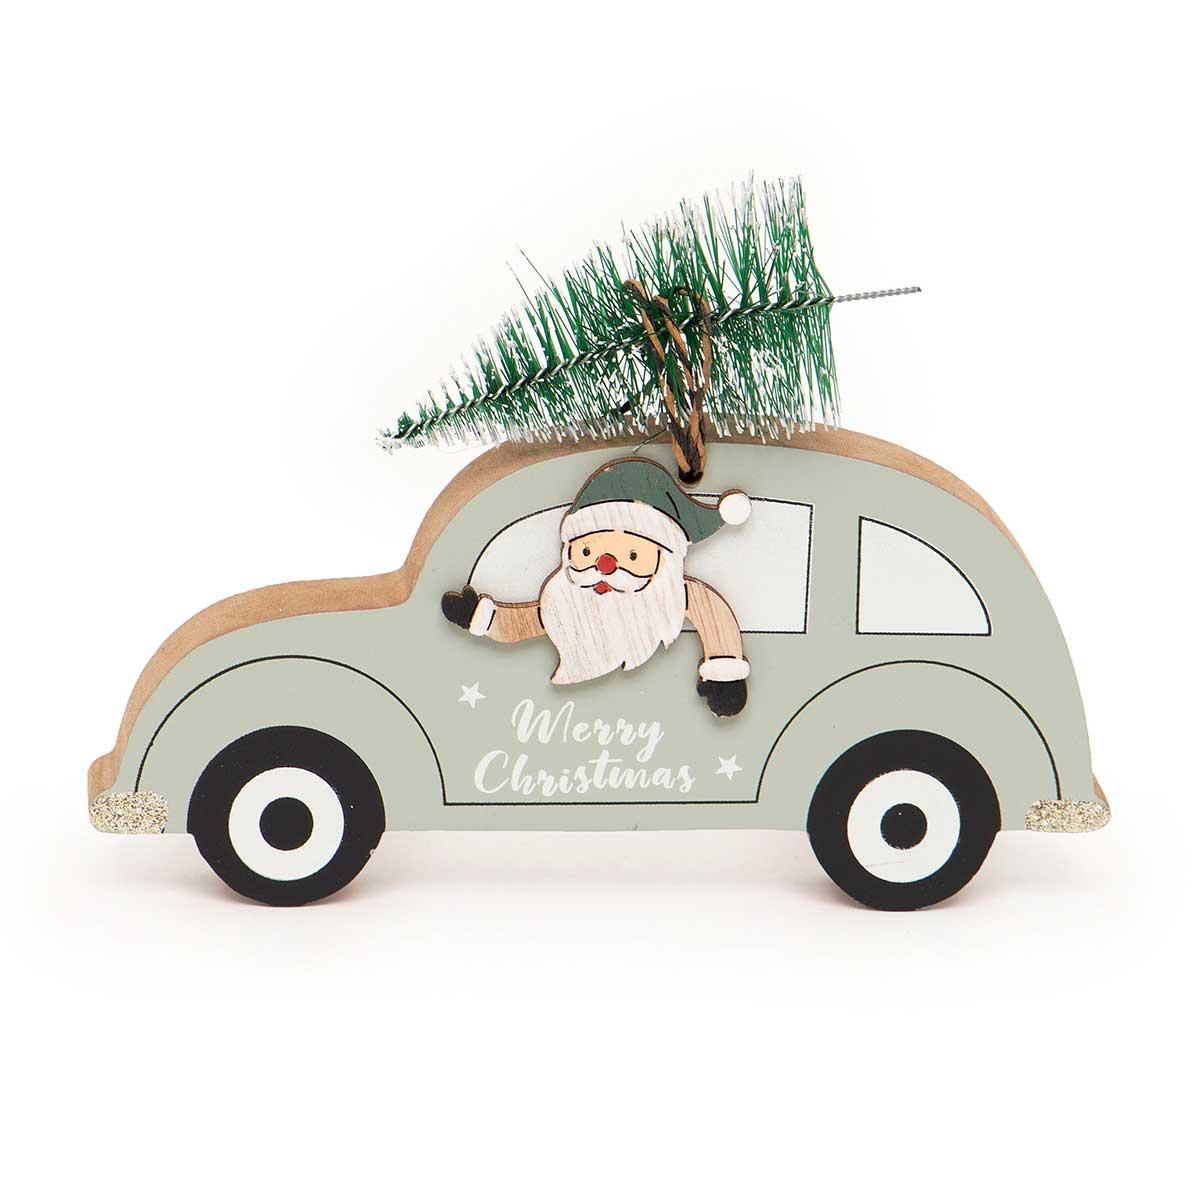 WOOD SANTA IN CAR WITH TREE